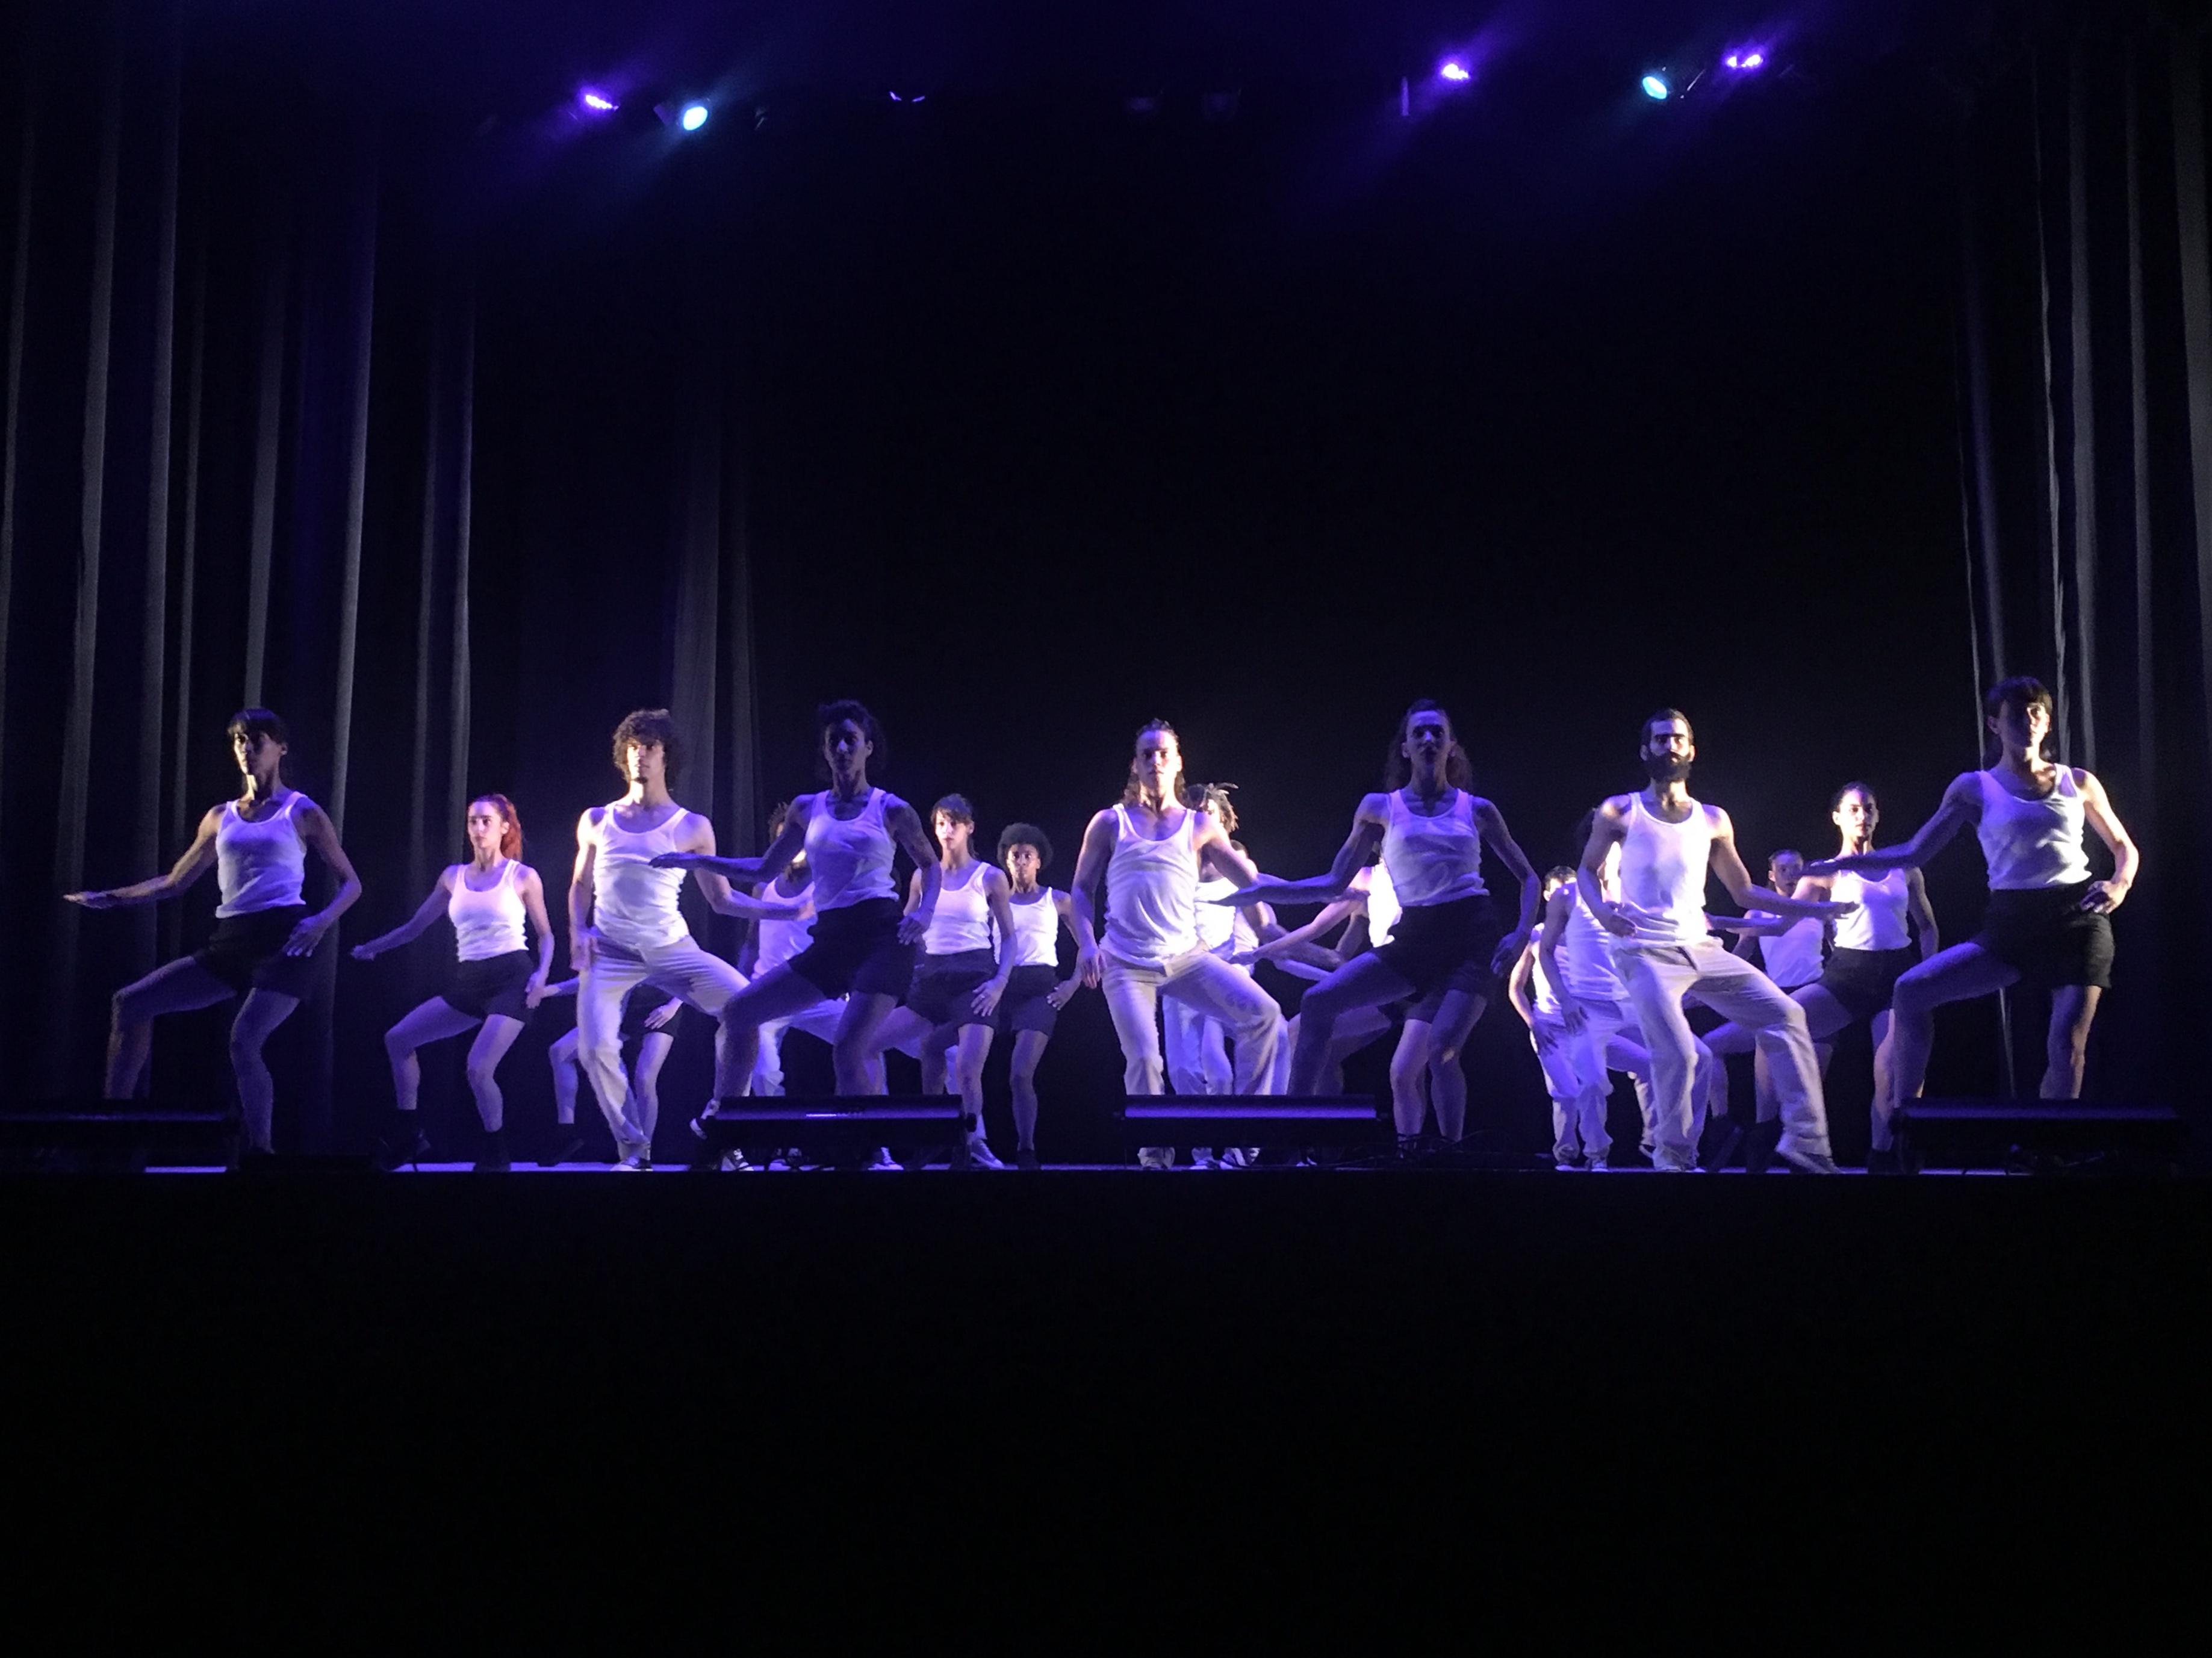 Mambo 321. Danza contemporánea de Cuba. Foto: Arlene Gómez